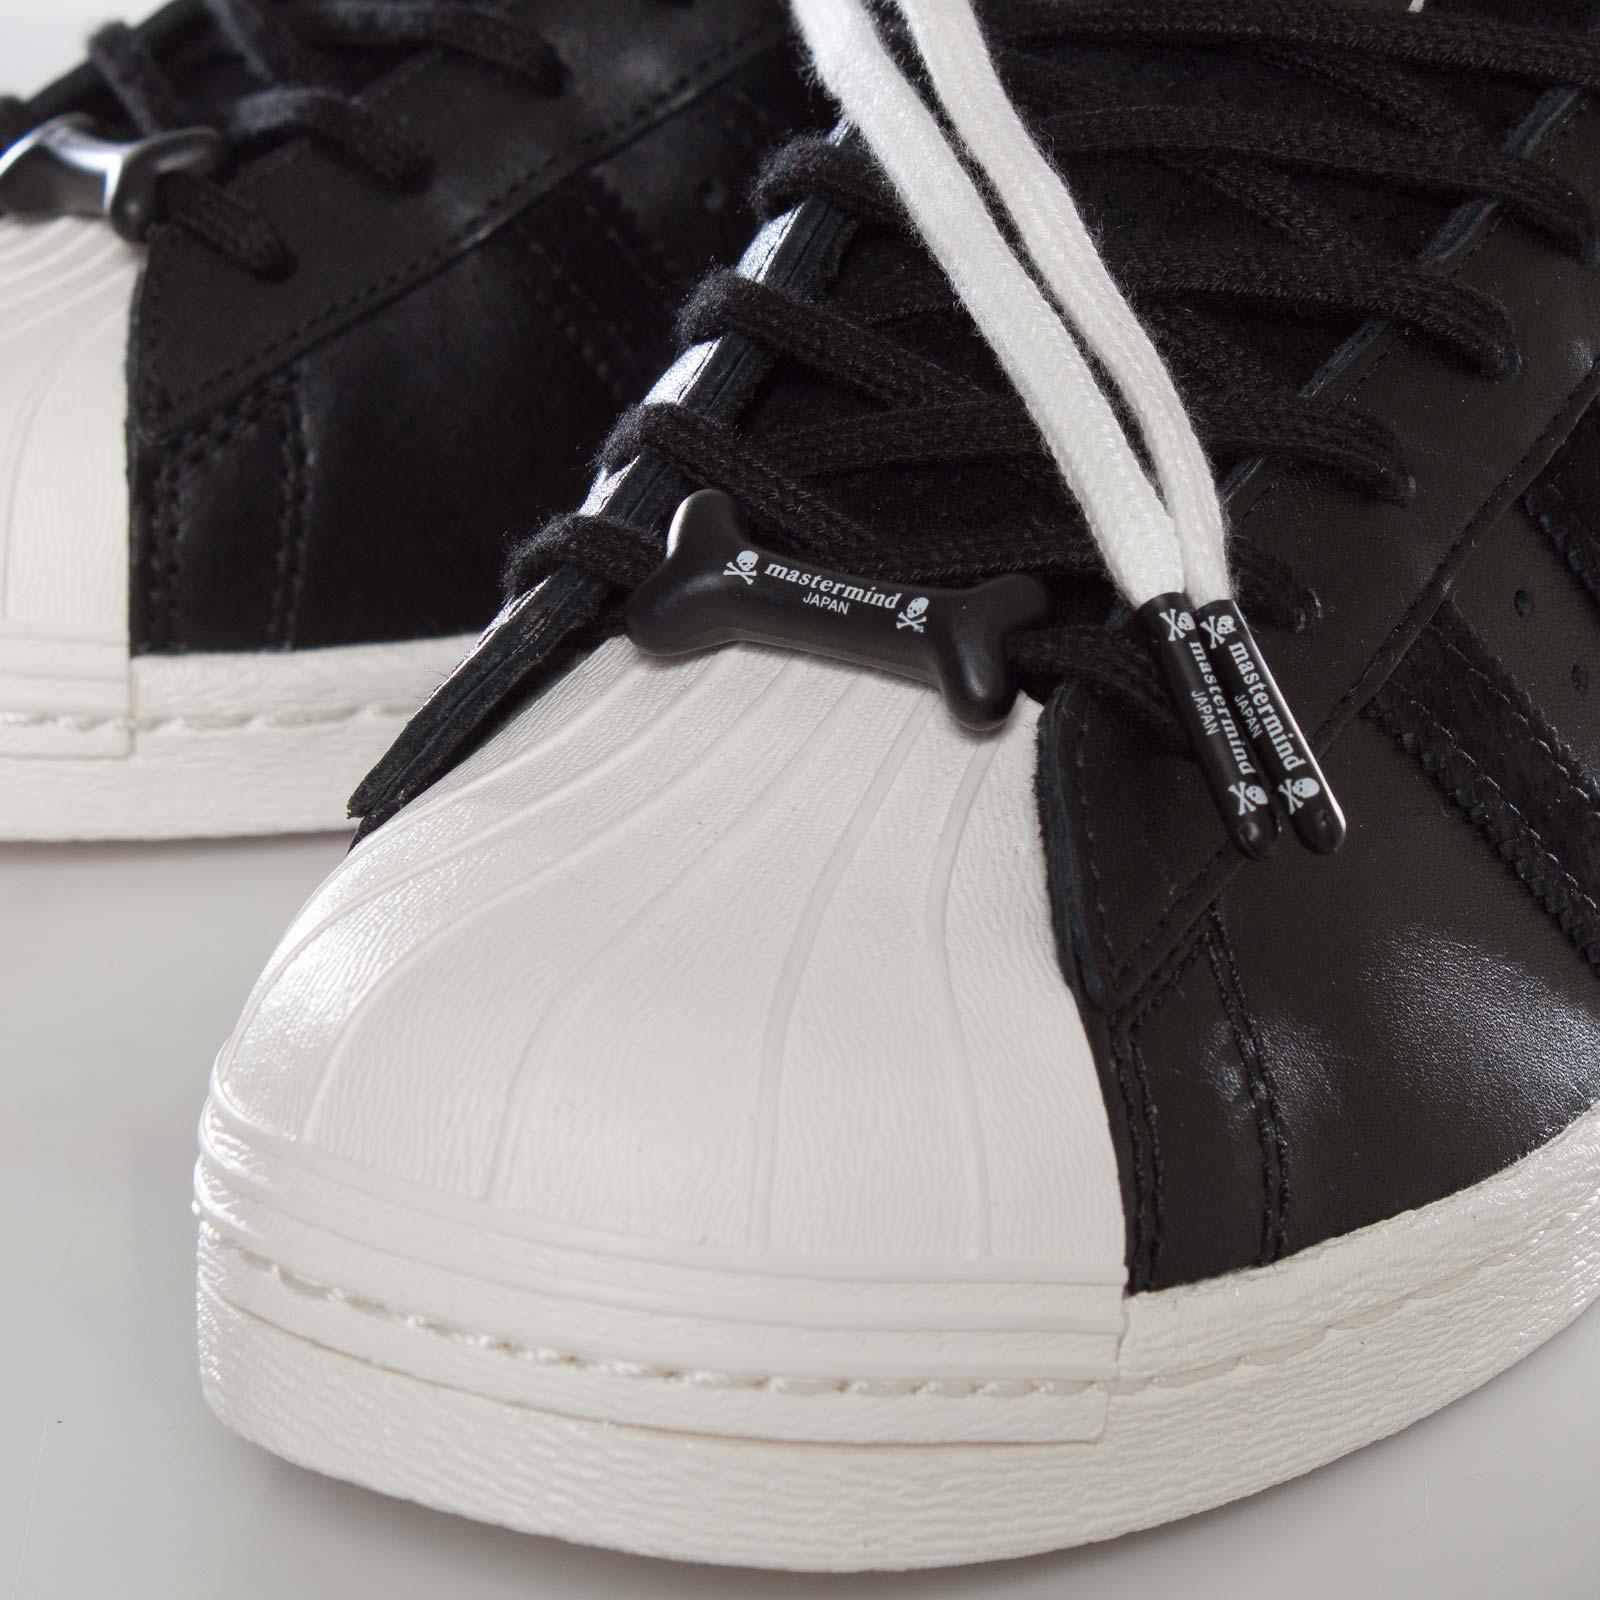 adidas Superstar 80s - mastermind